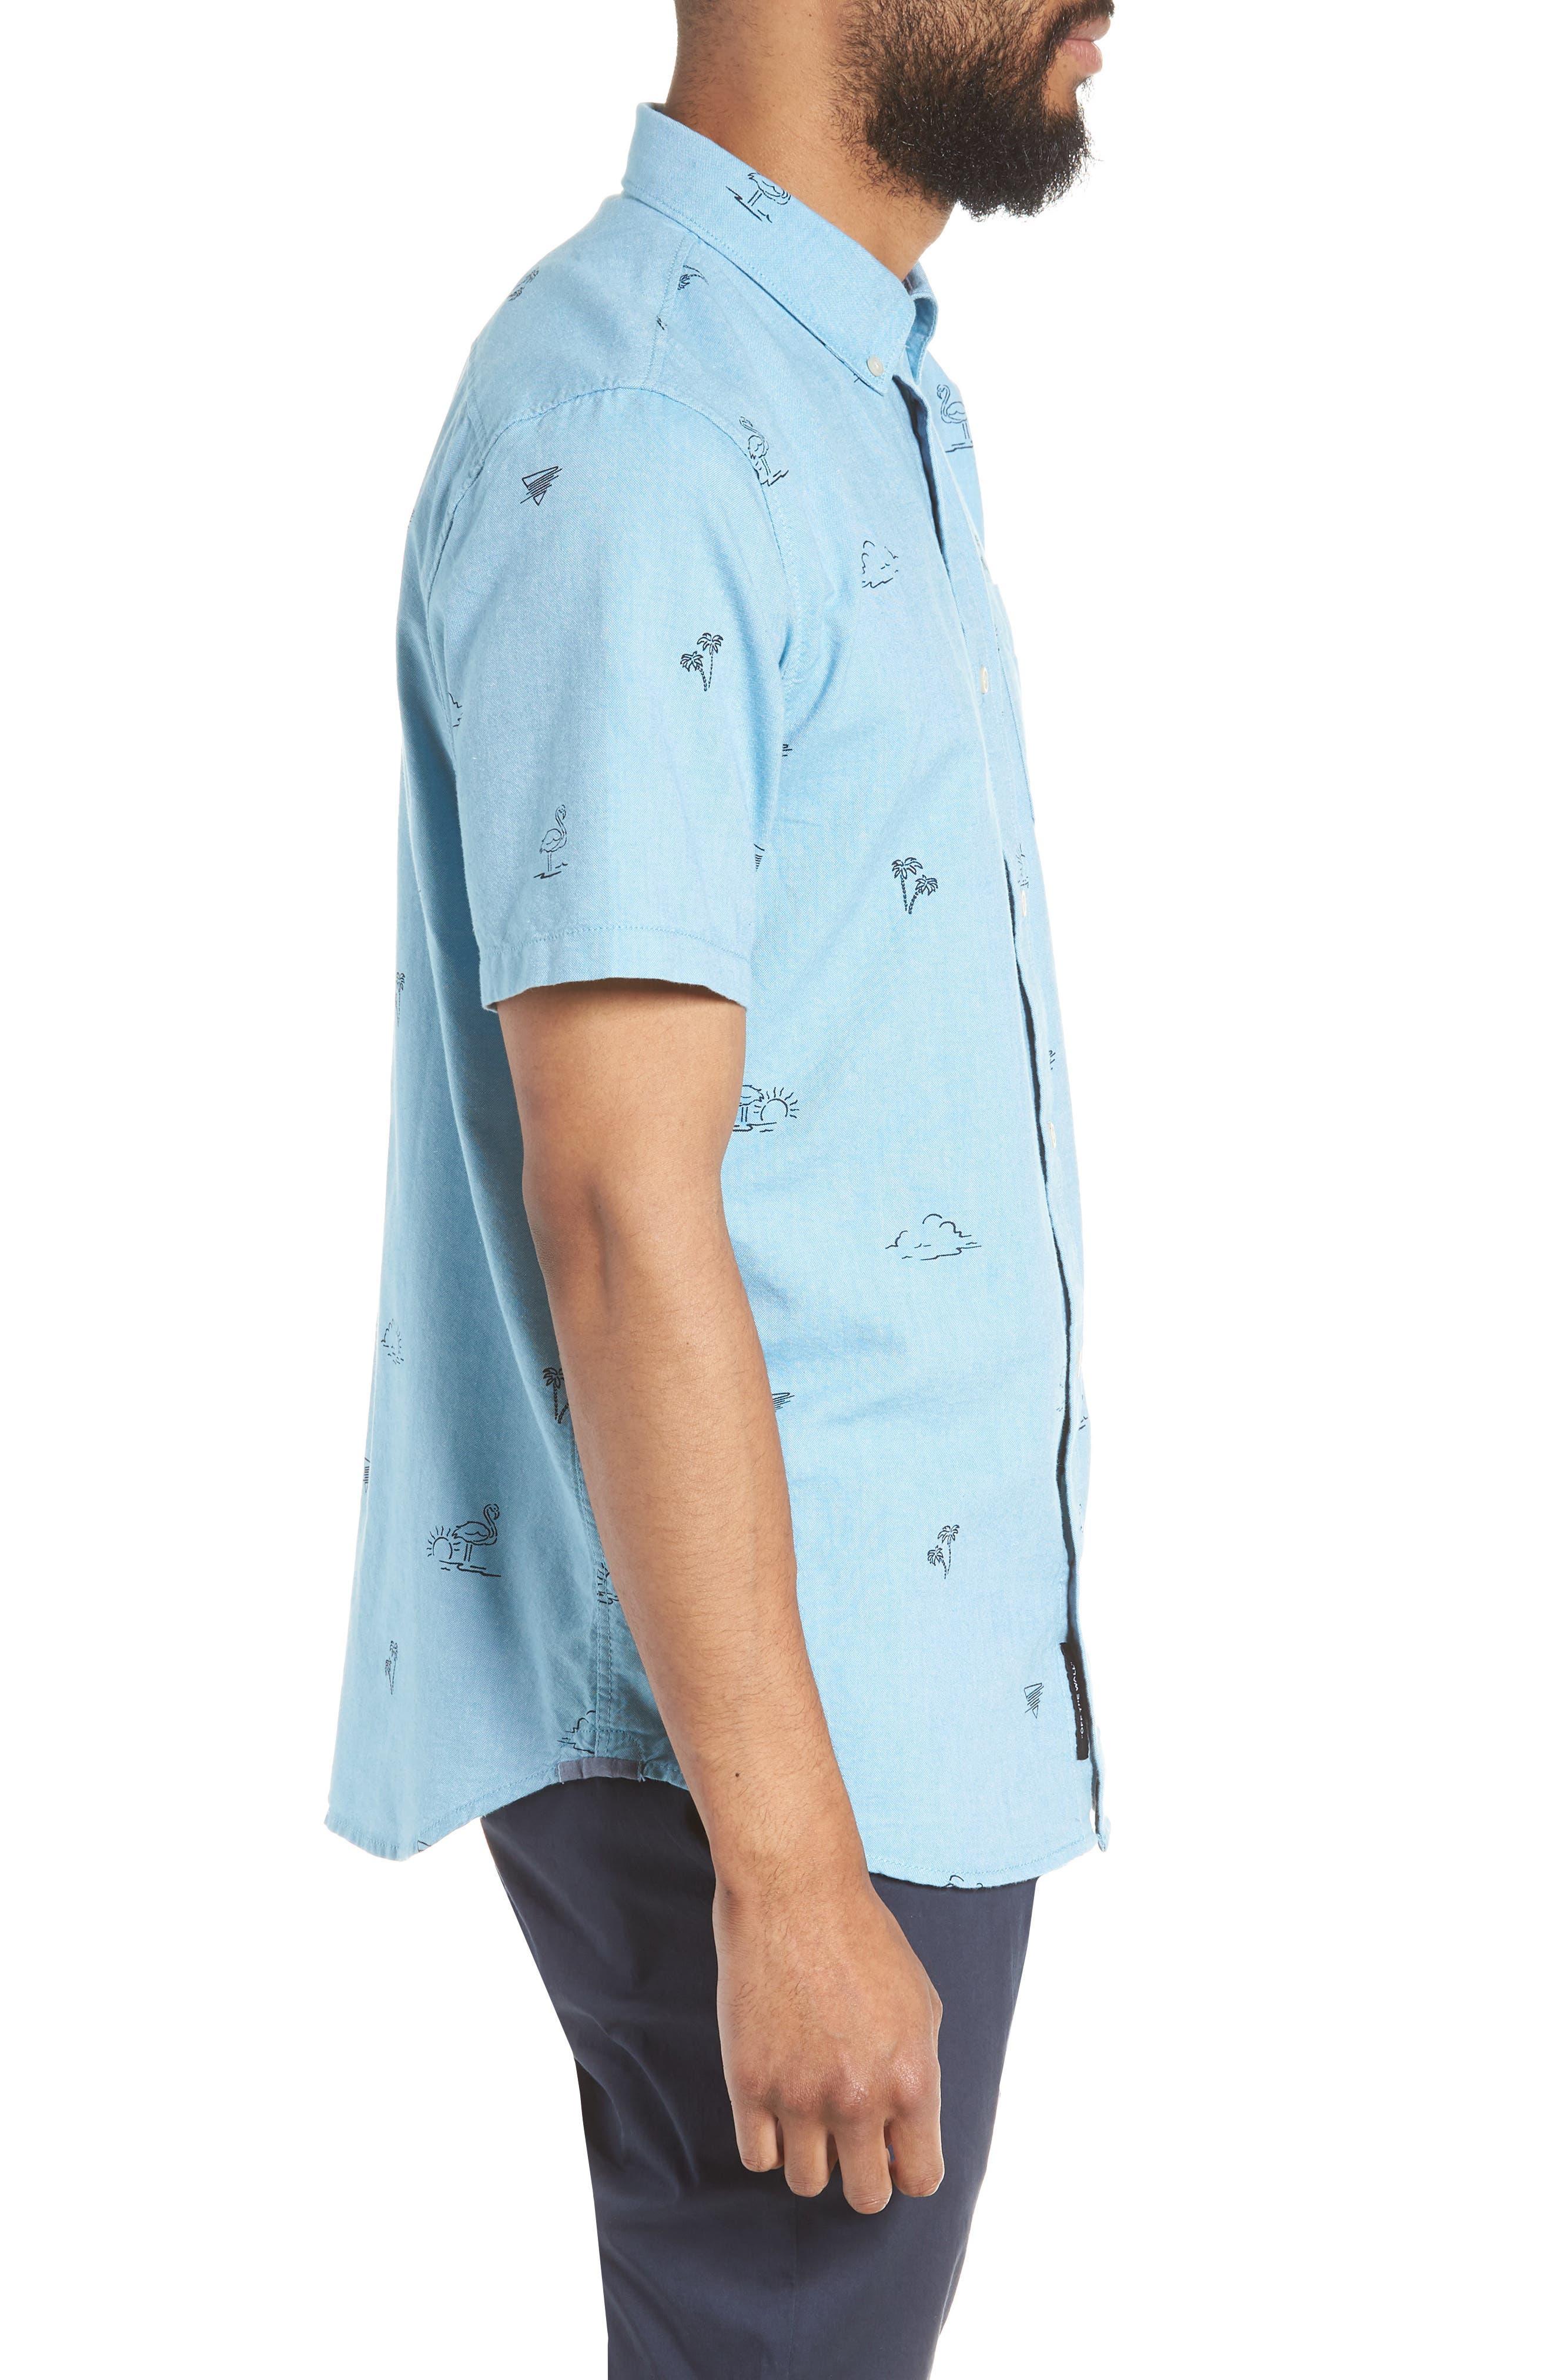 Houser Woven Shirt,                             Alternate thumbnail 4, color,                             Blue Moon Road Trippin